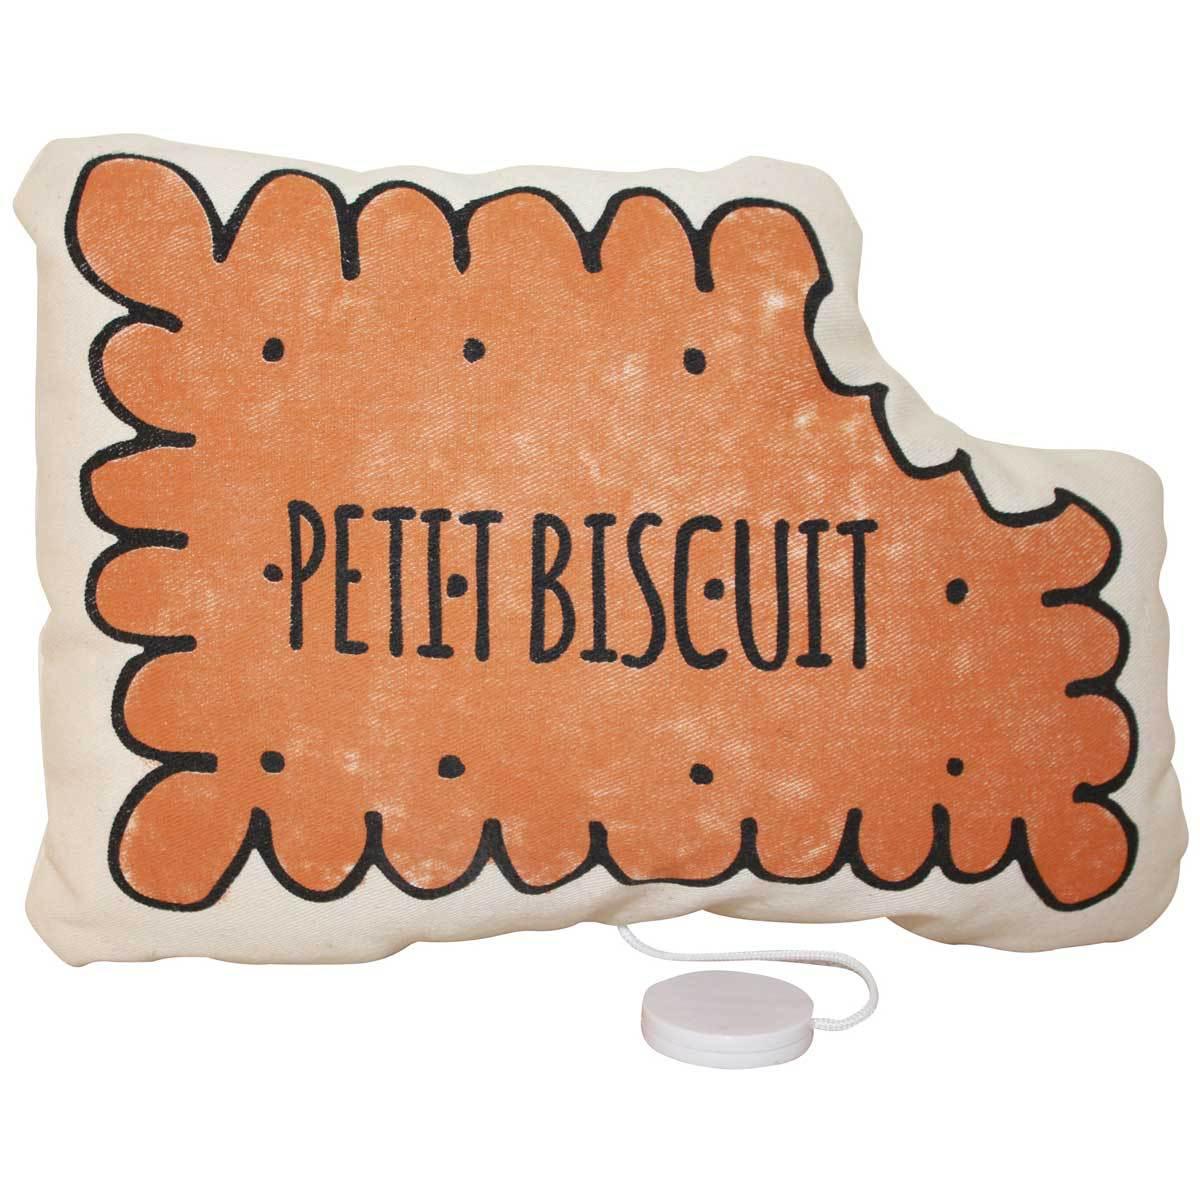 annabel kern coussin musical petit biscuit coussin. Black Bedroom Furniture Sets. Home Design Ideas